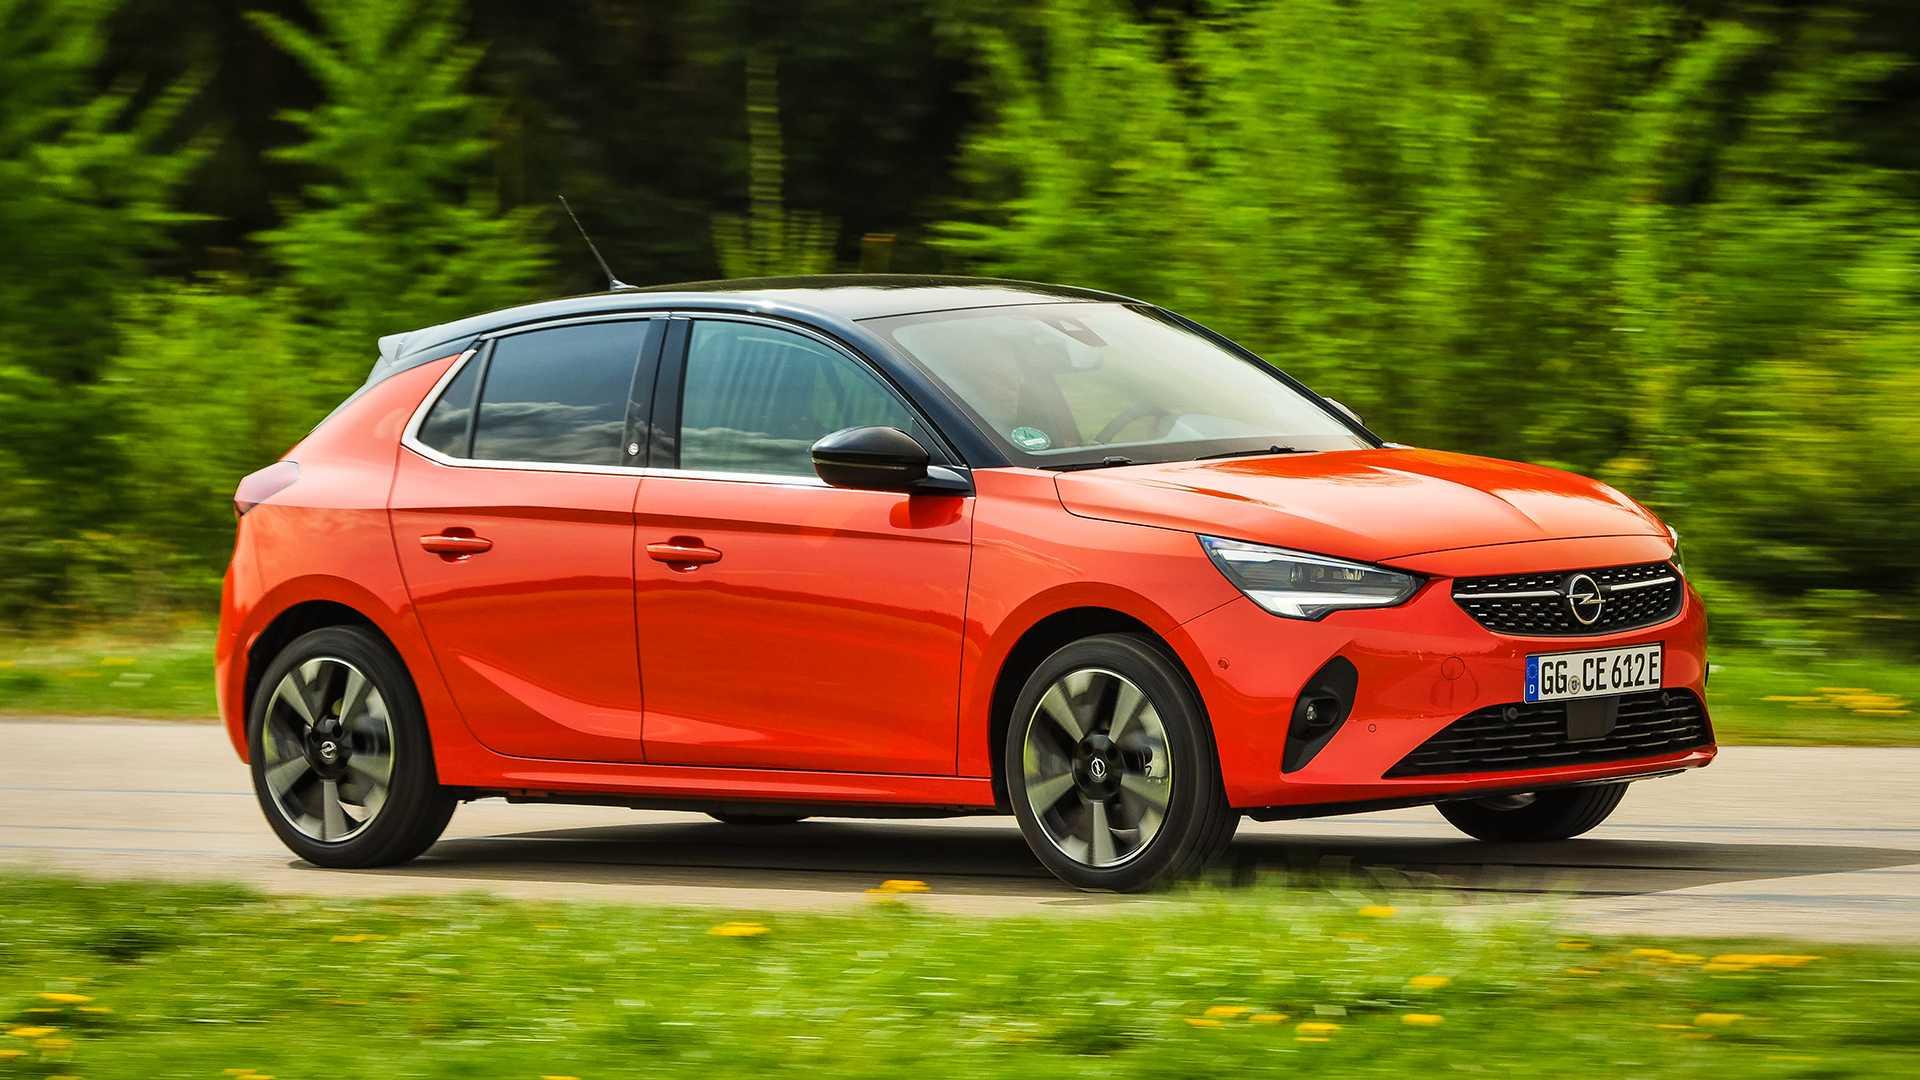 The New 2021 Opel Corsa-e: Specs, Price & Photos - CarsRumors